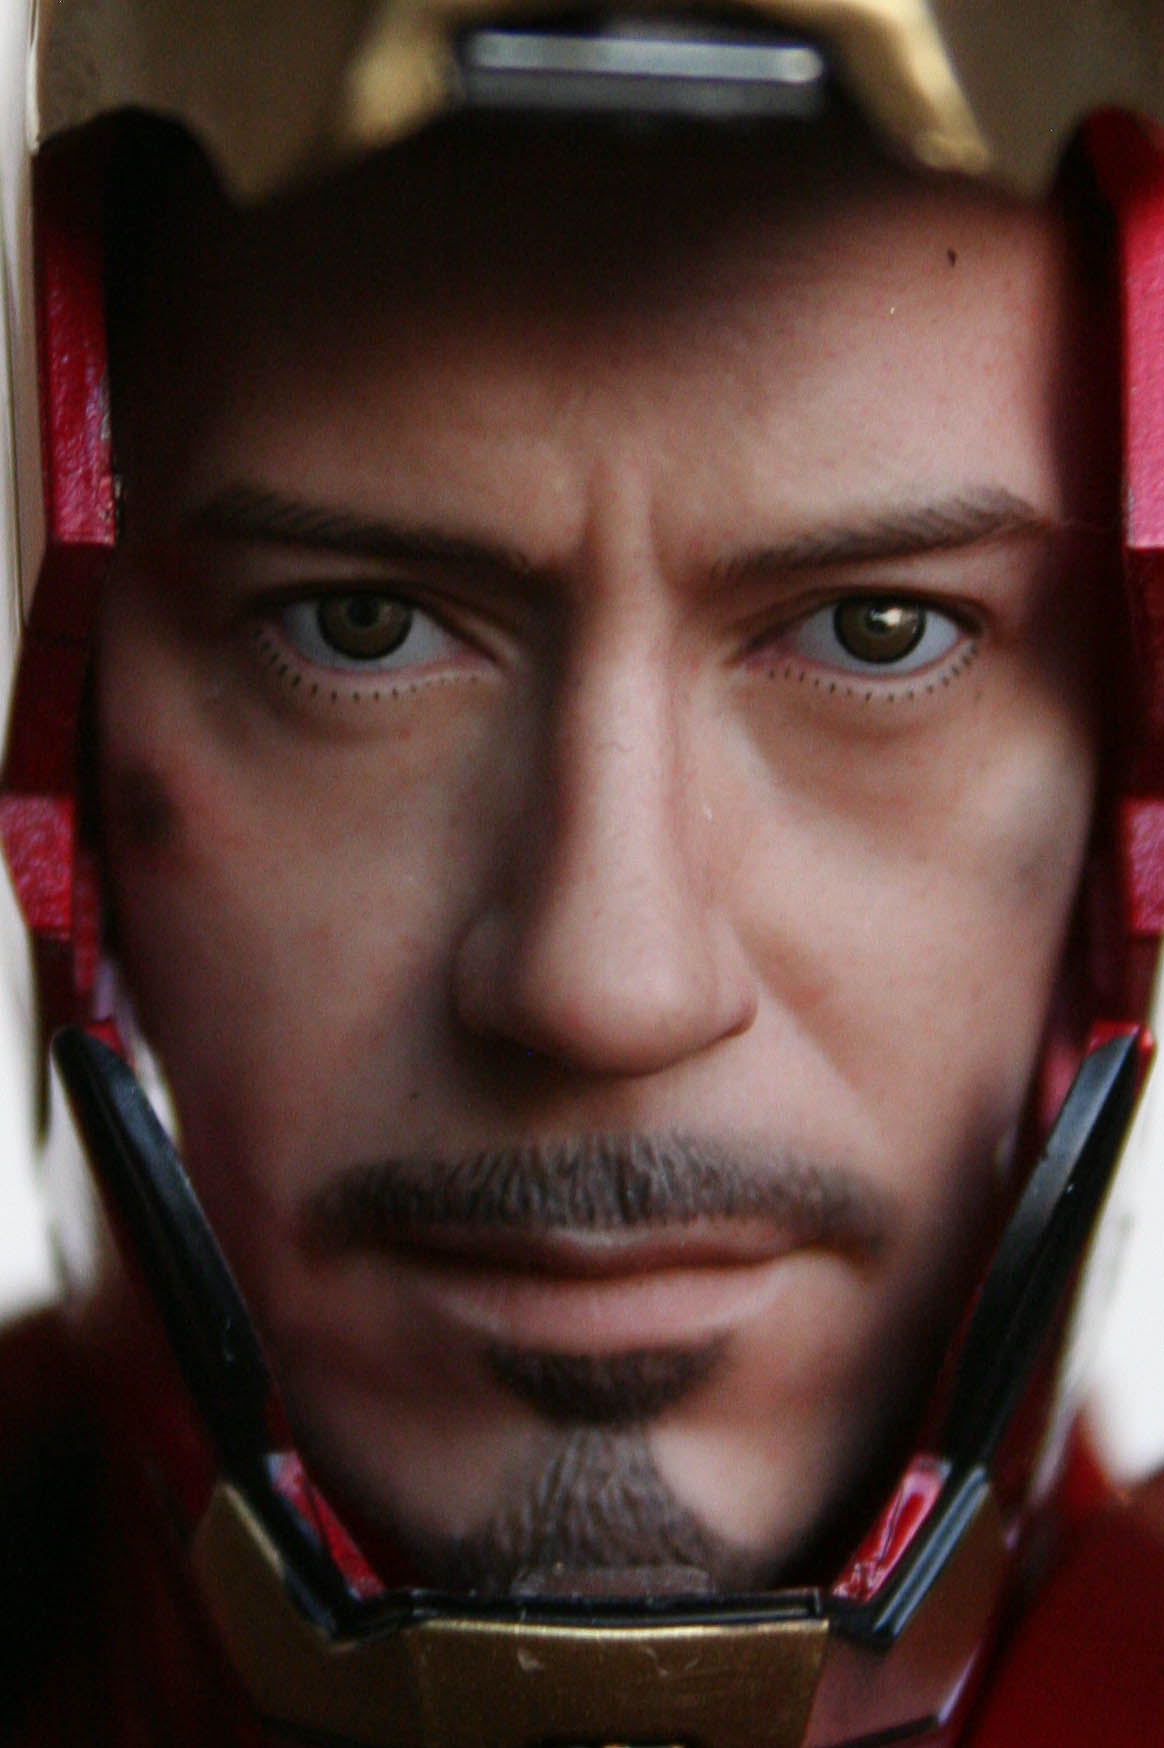 Robert Downey Jr Eyela... Robert Downey